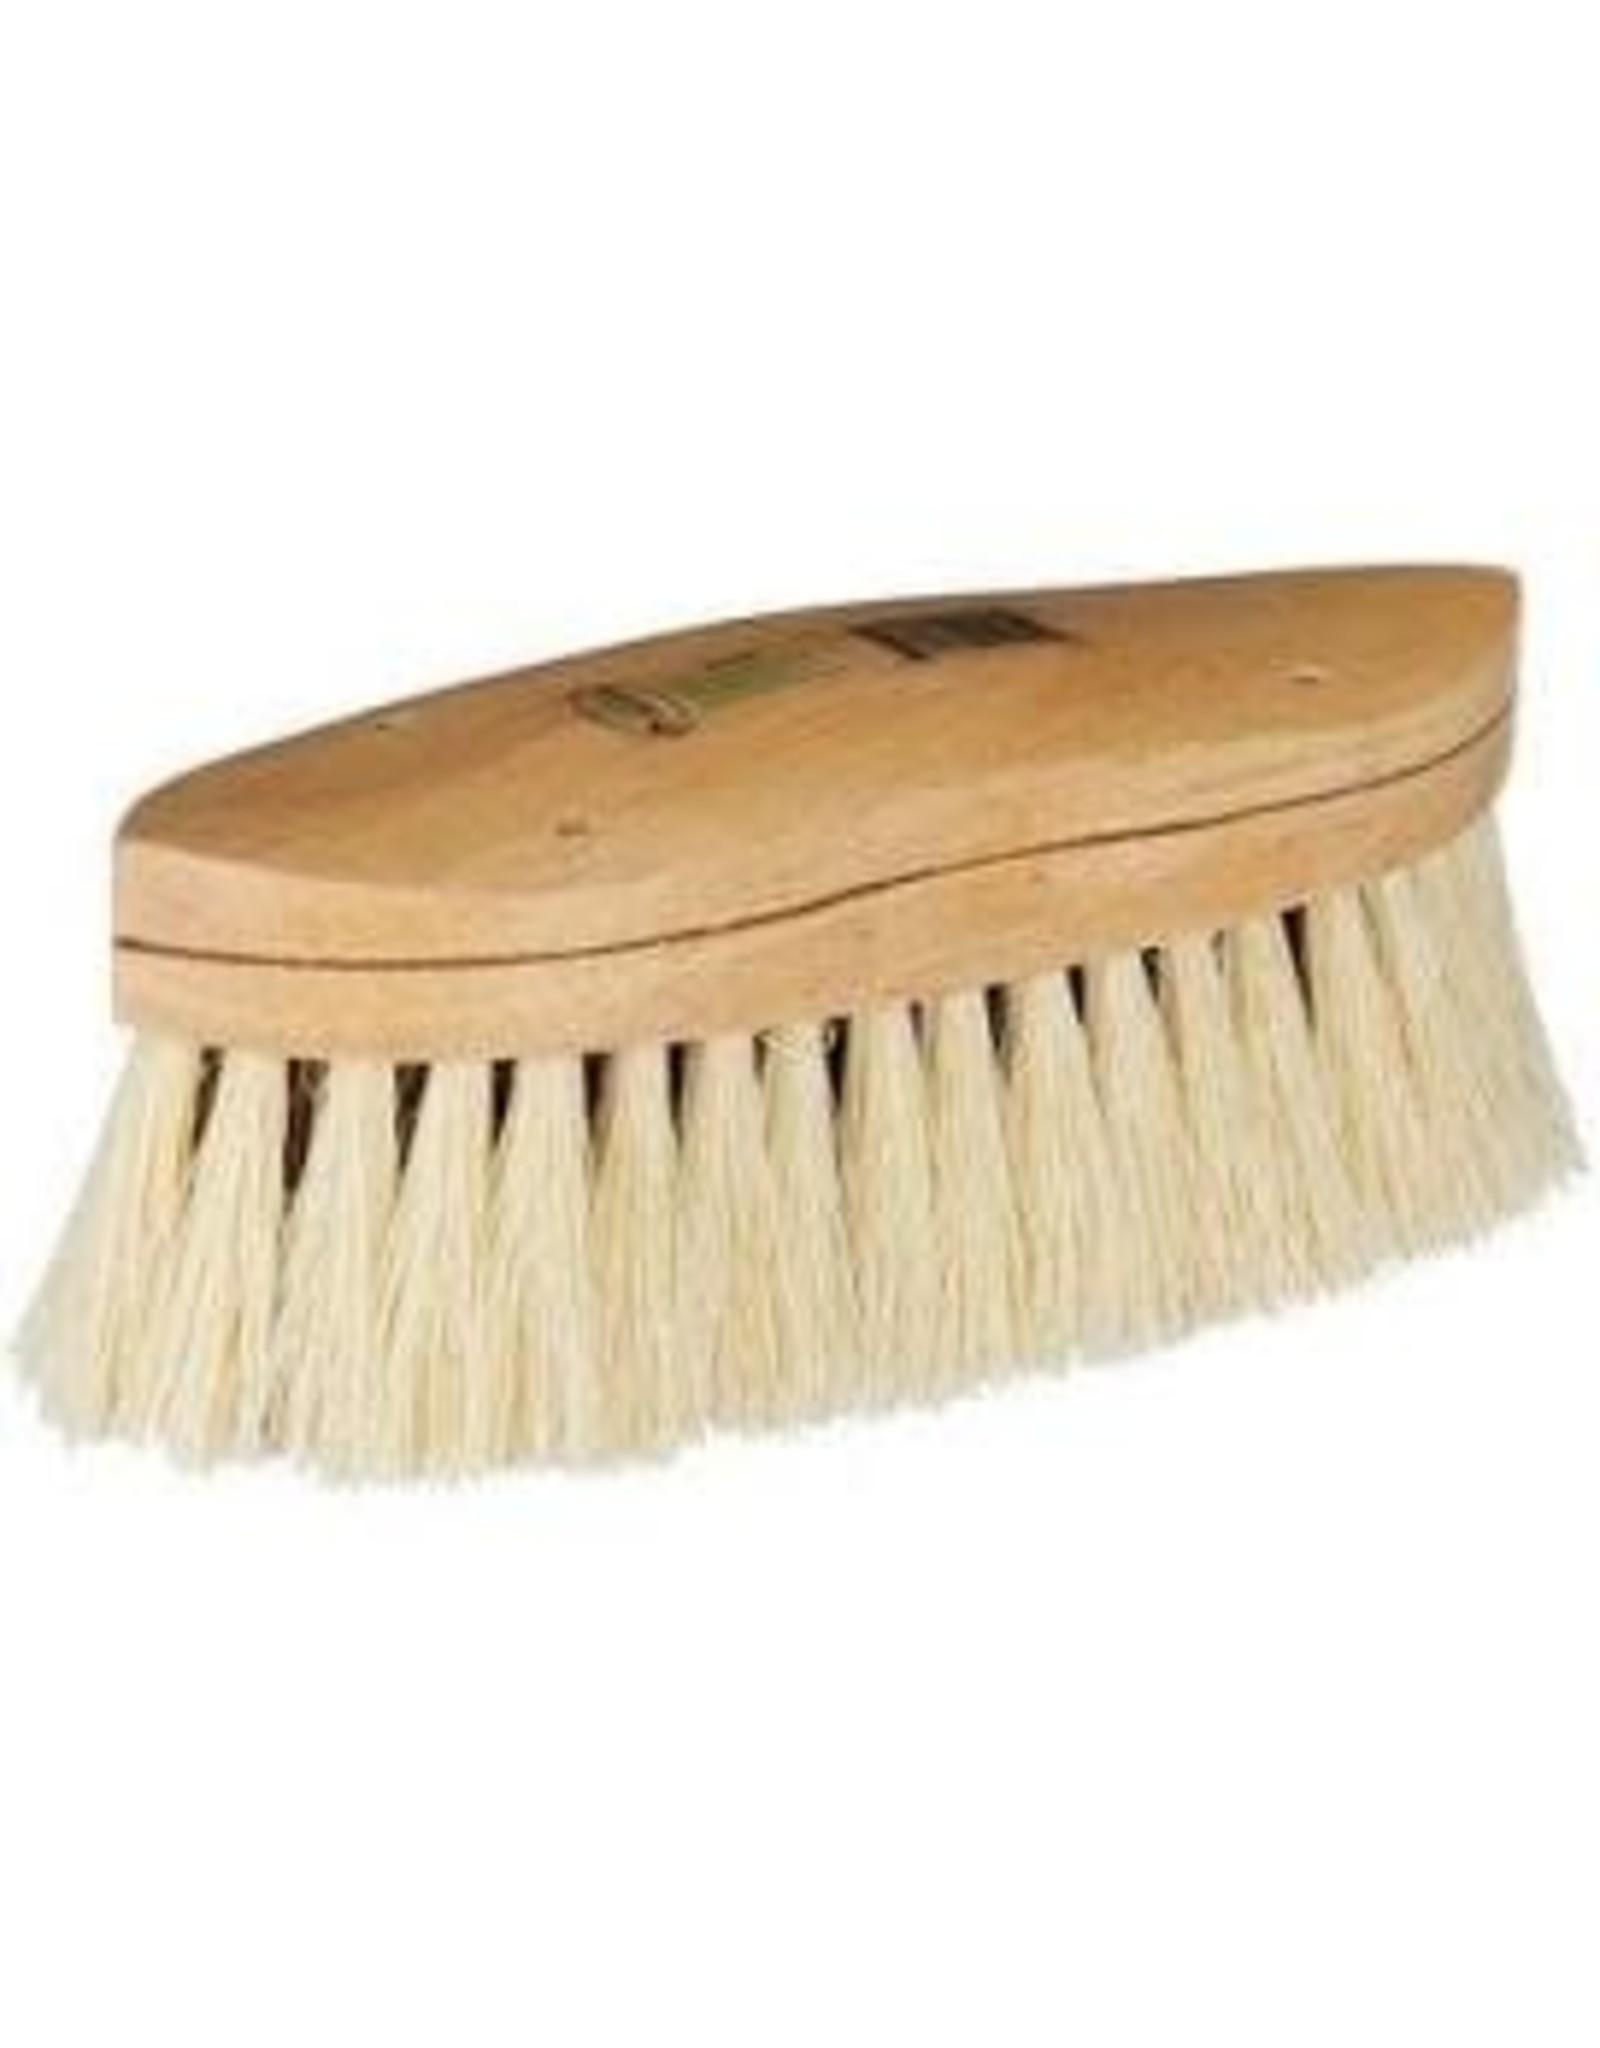 Brush, Legends Belmont